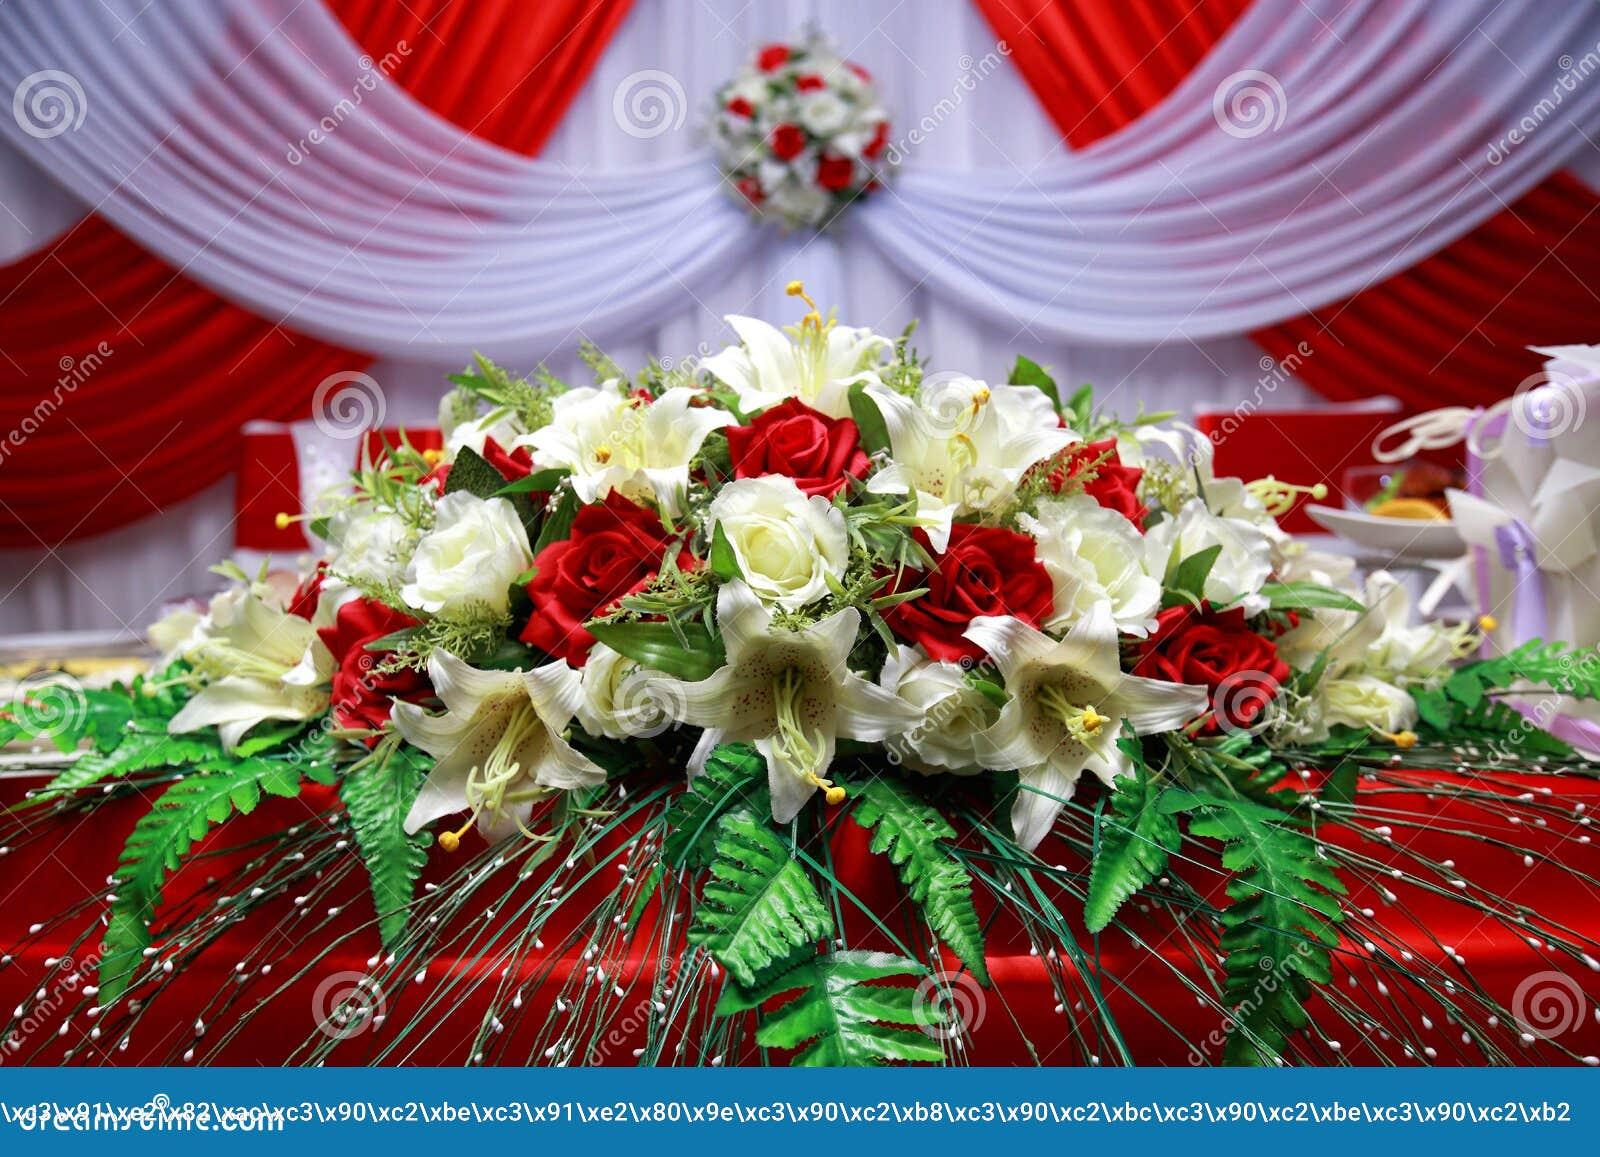 Festive Table Stock Photo - Image: 52293540